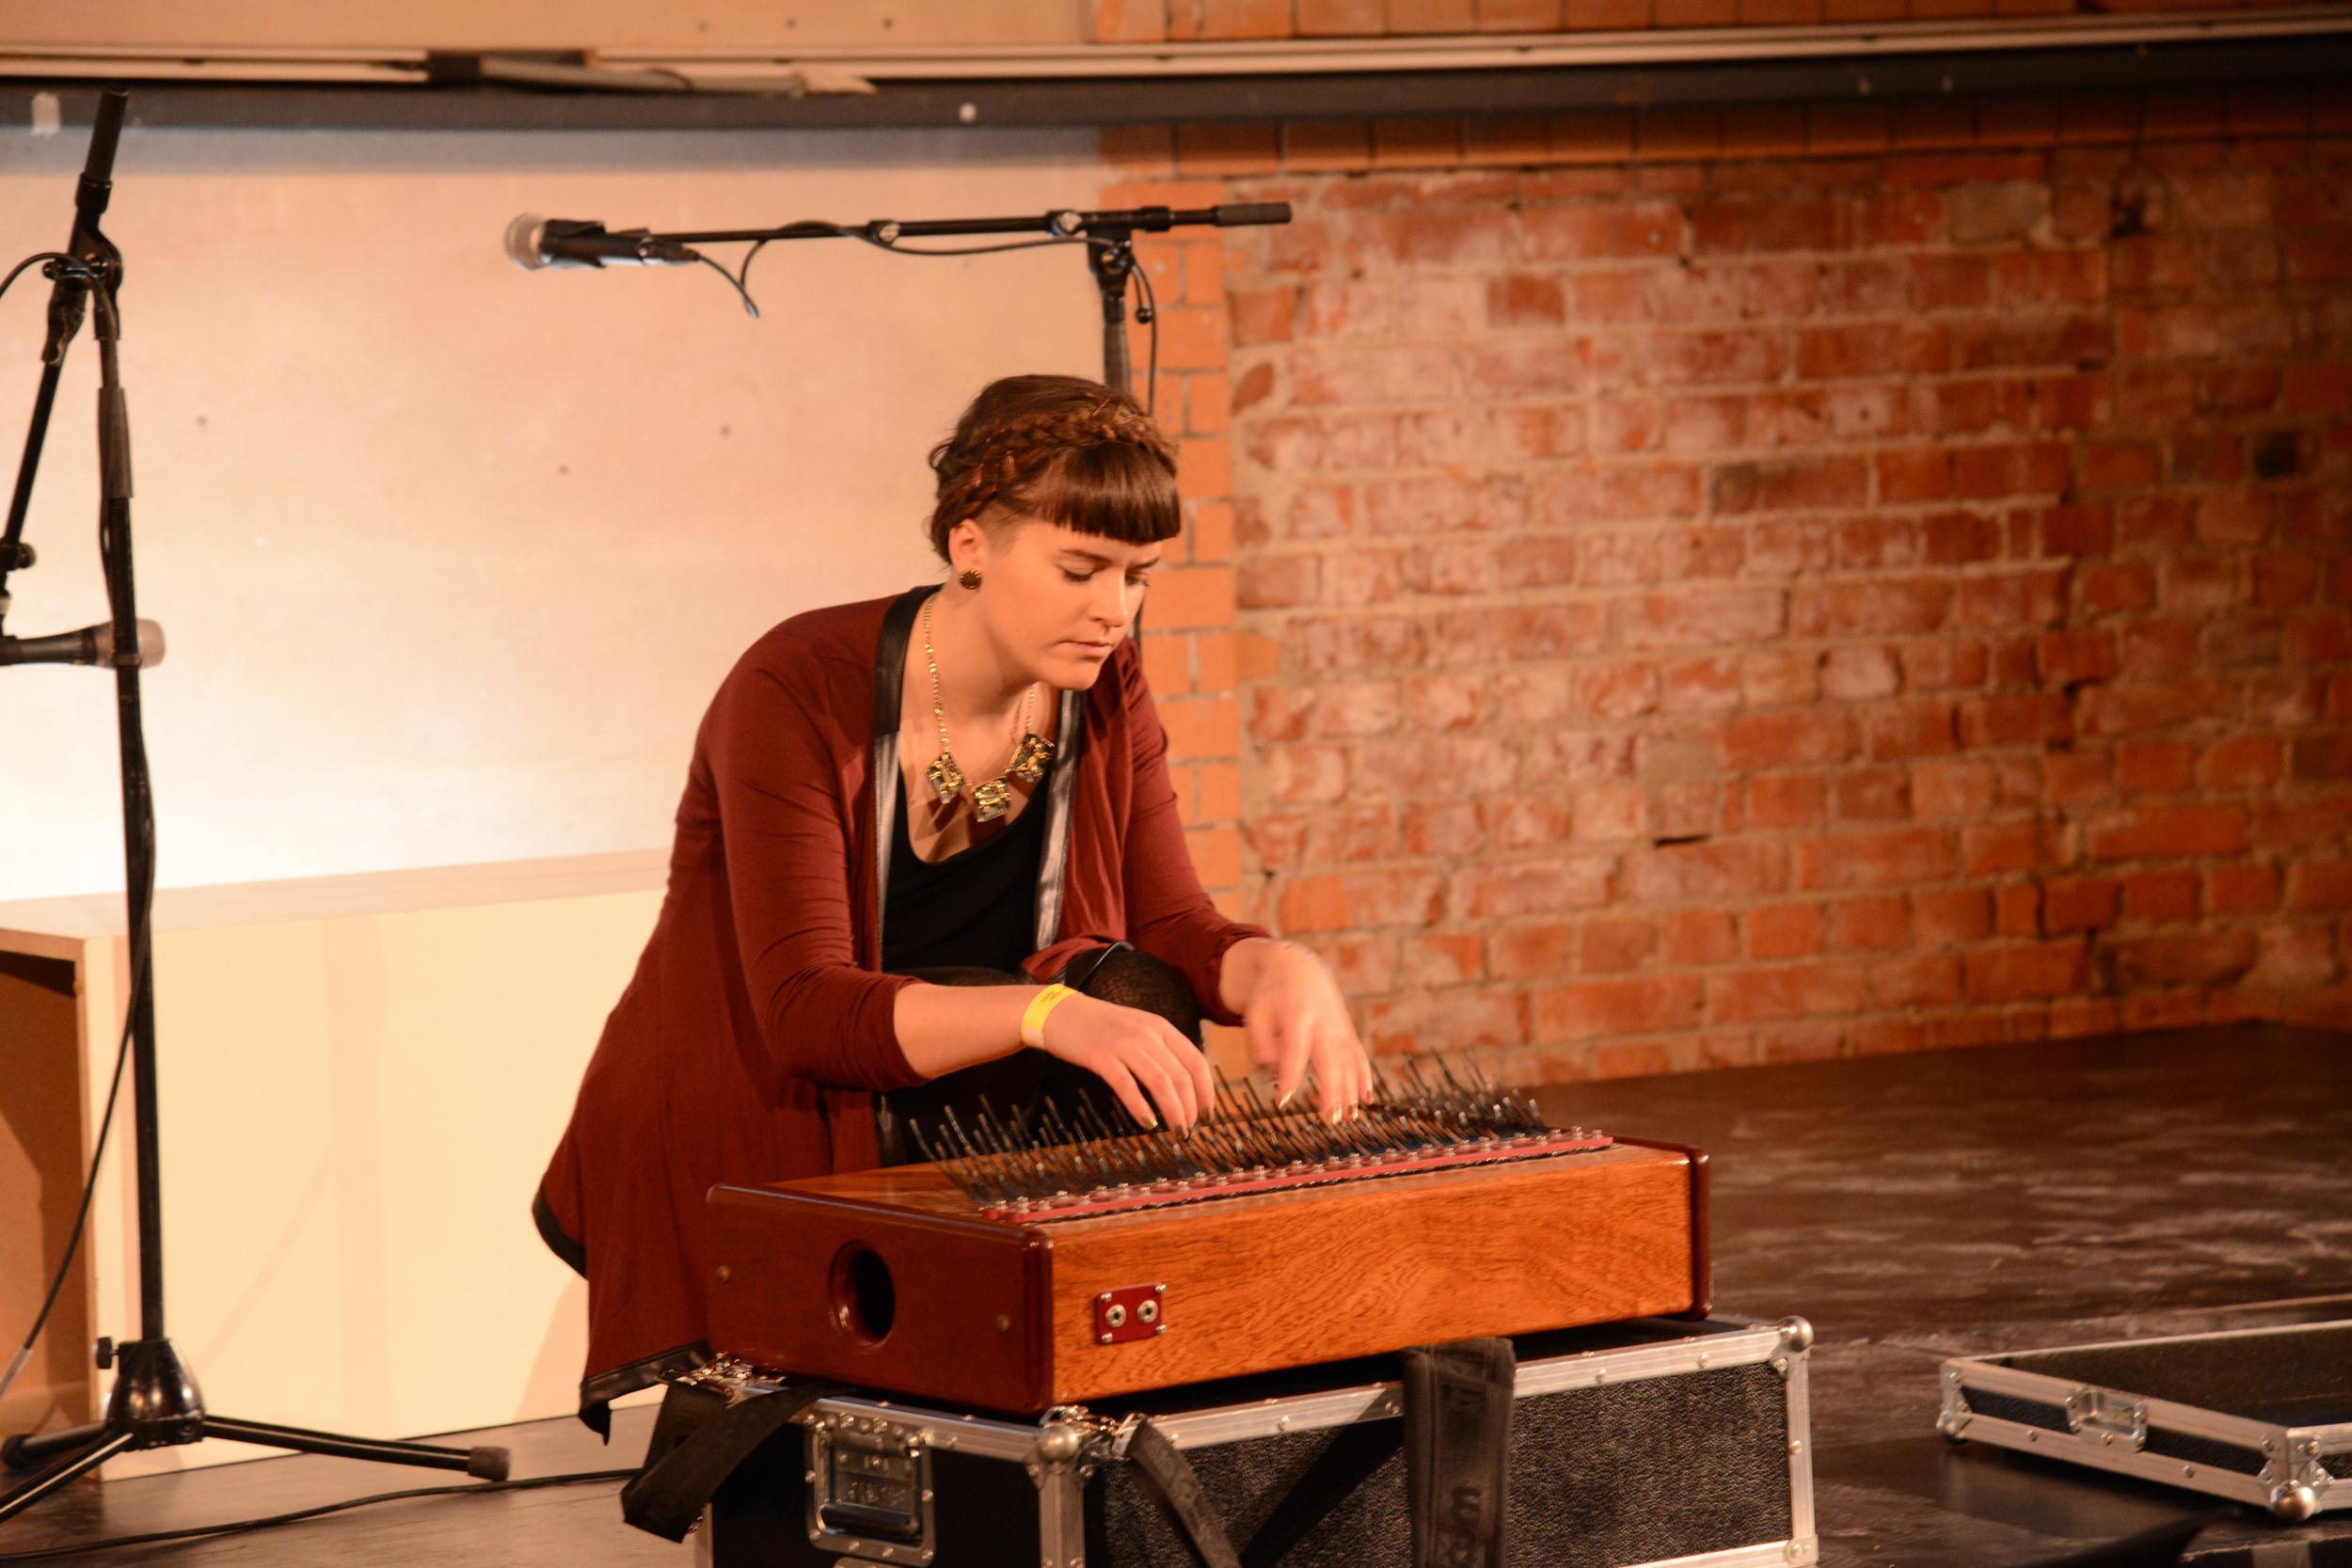 Photo by  Kim Grønneberg - Live performance at Pecha Kucha Vol 29 - 05.12.13